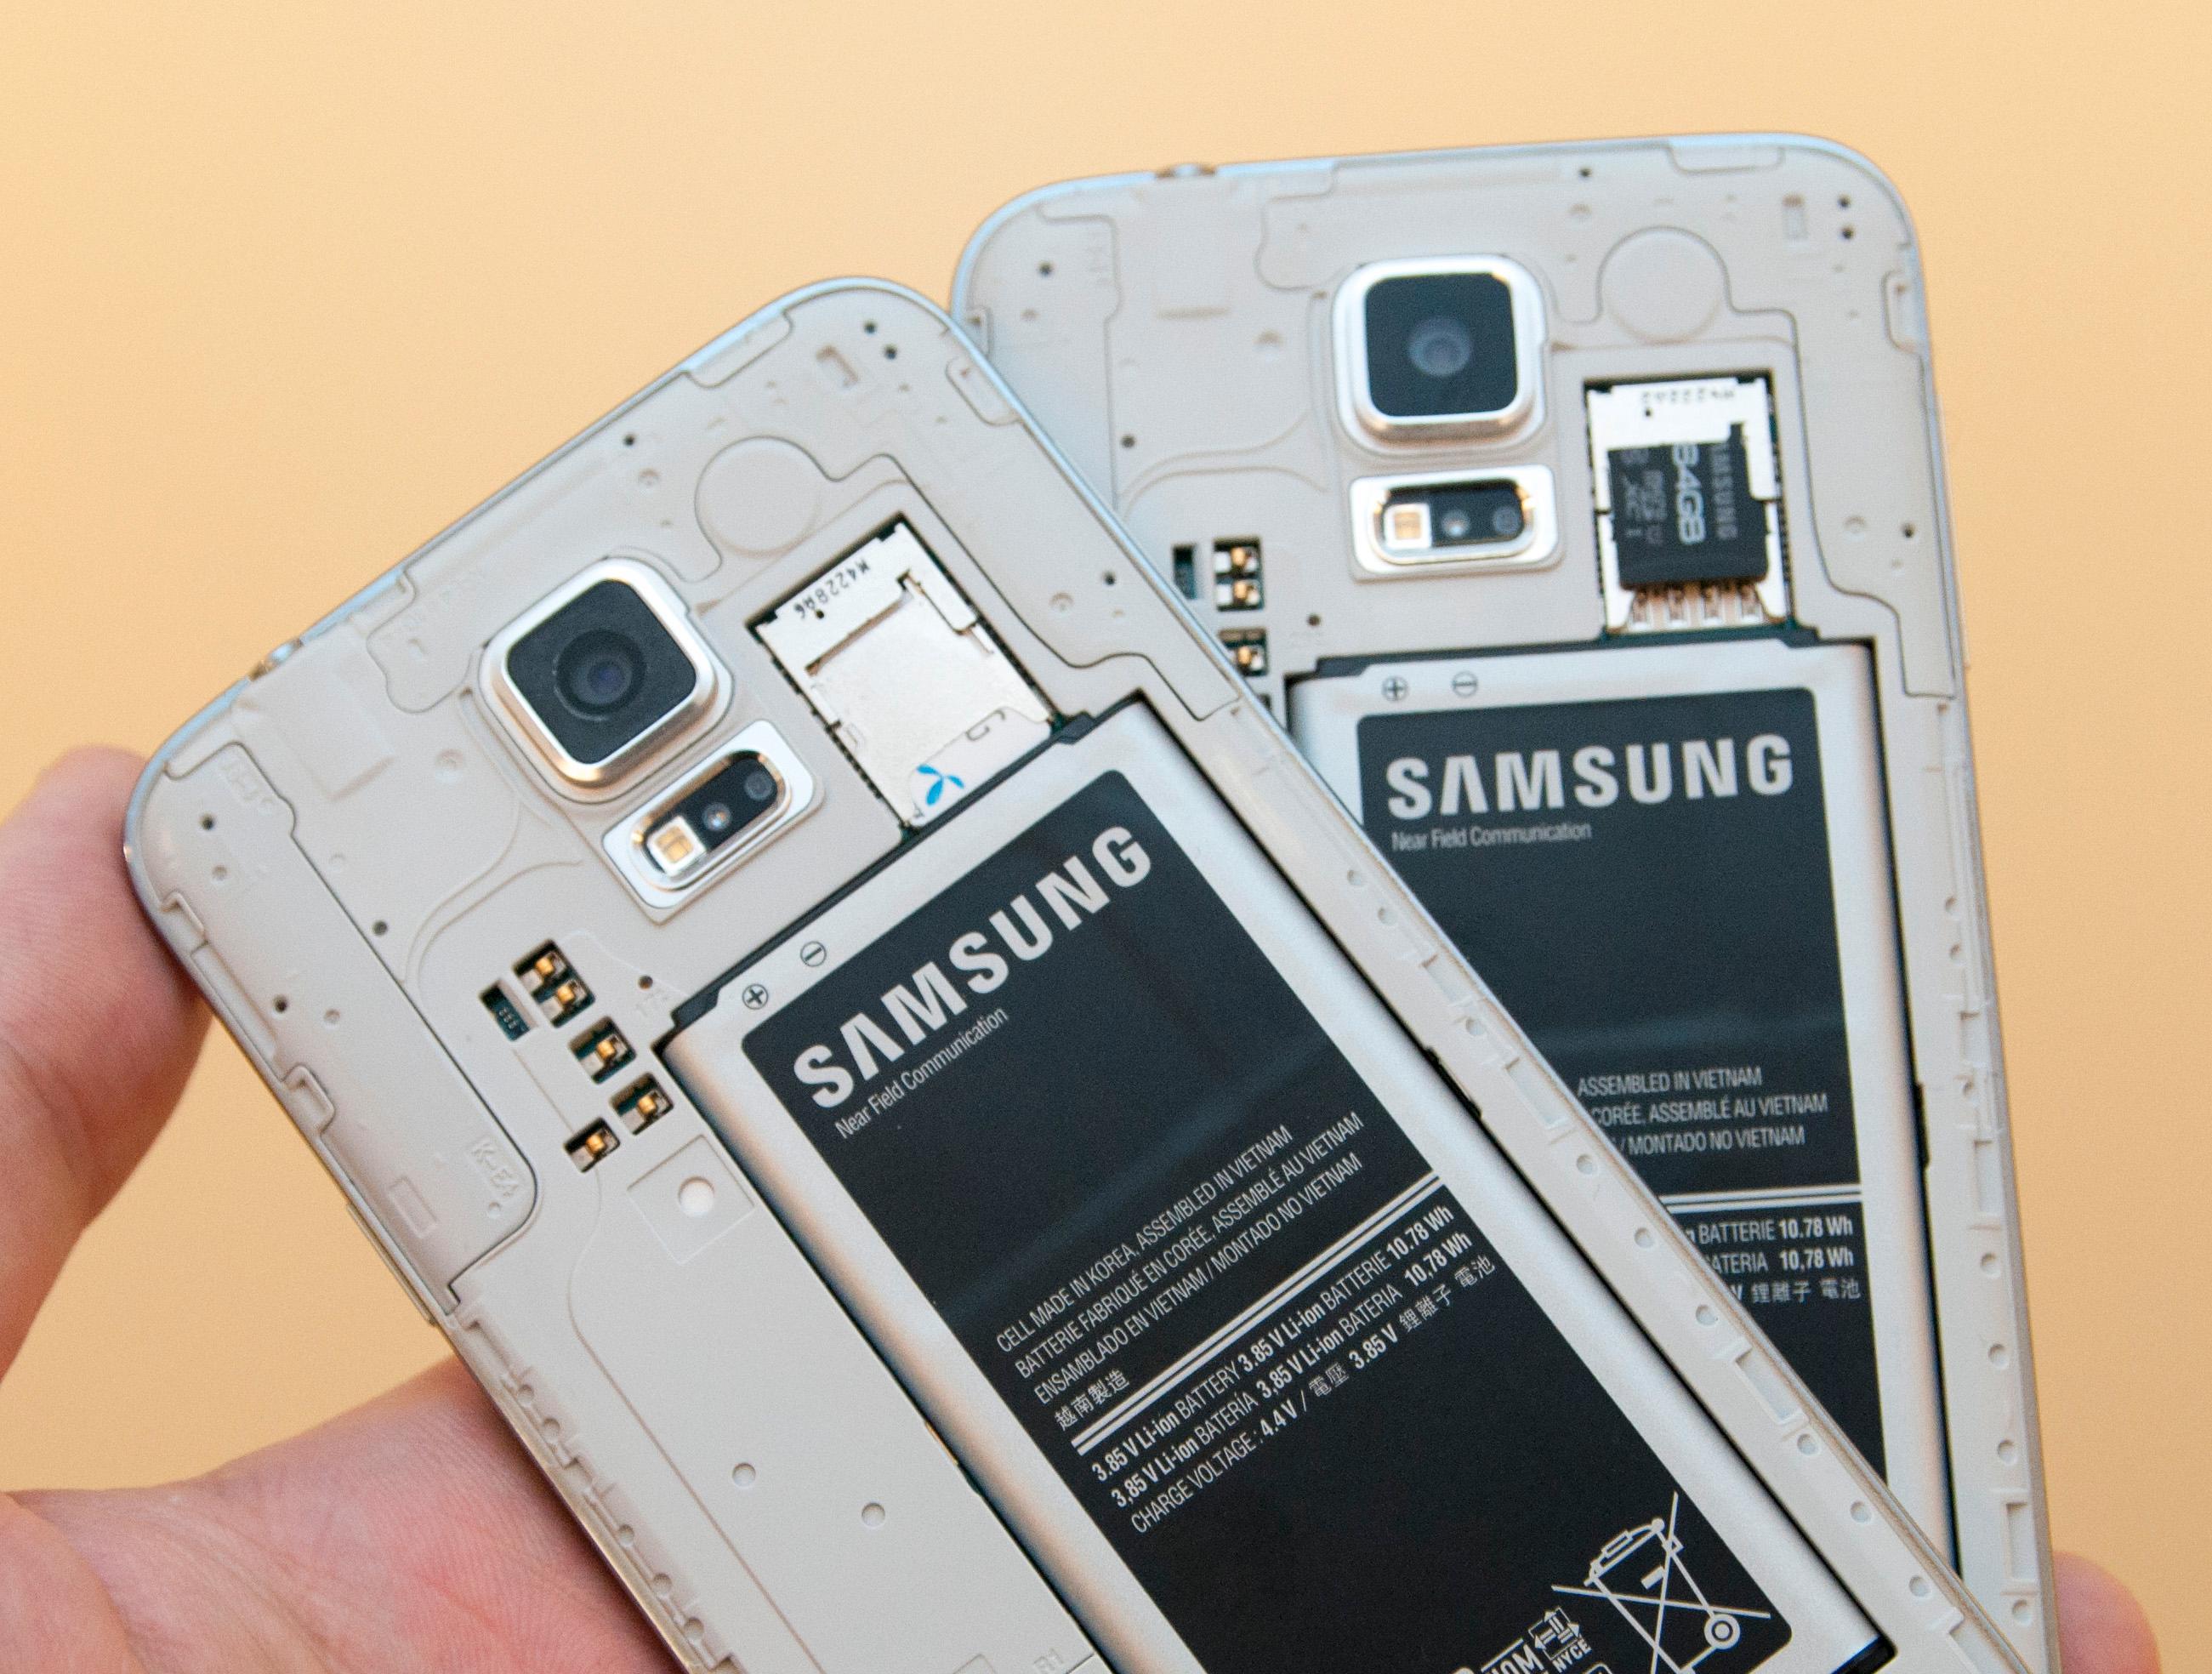 Under batteridekselet er det plass for Micro-SIM og minnekort.Foto: Finn Jarle Kvalheim, Amobil.no